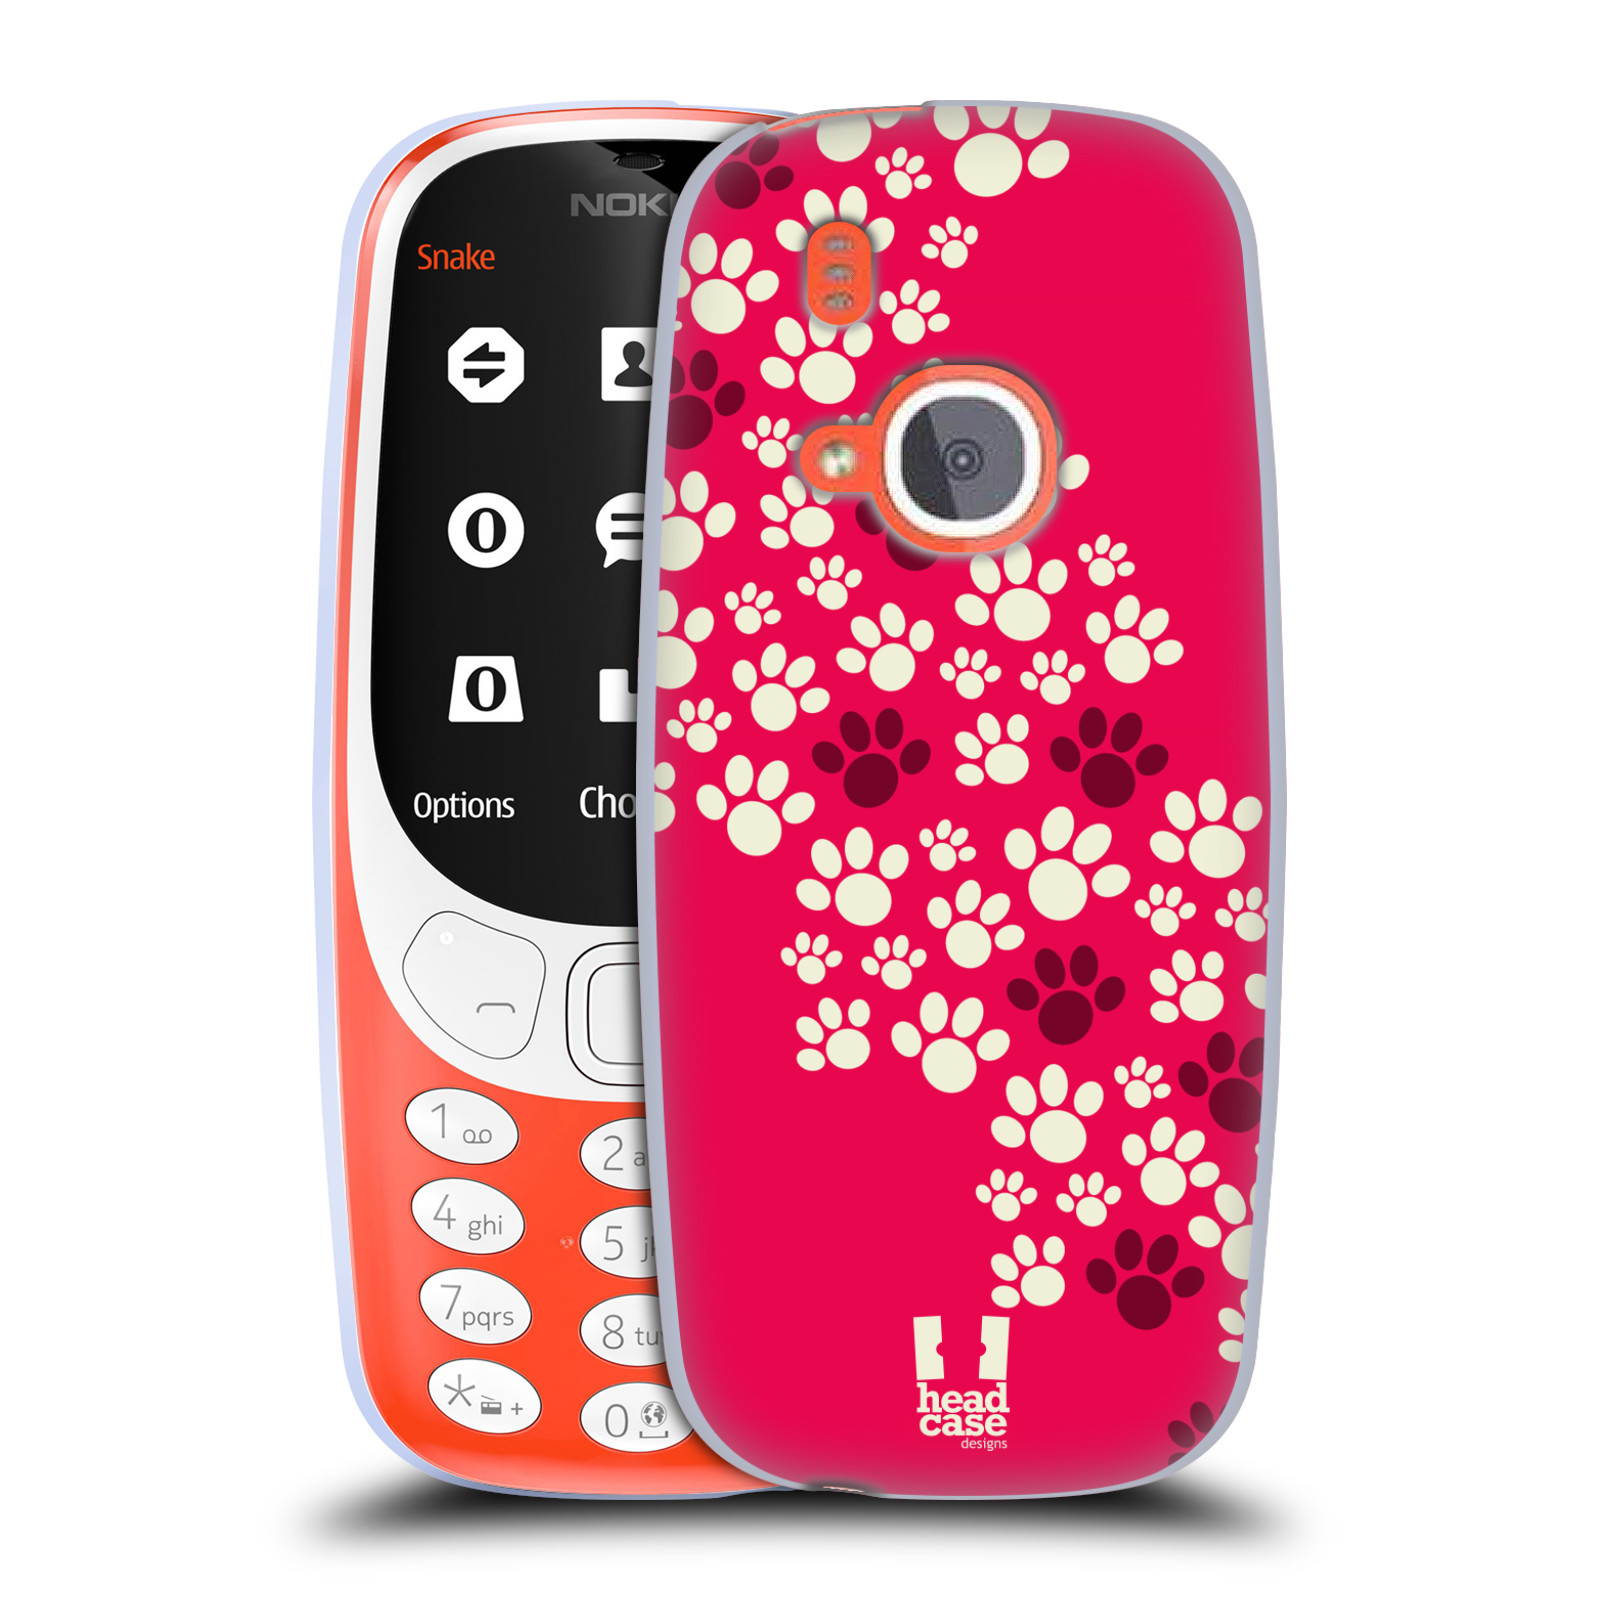 Silikonové pouzdro na mobil Nokia 3310 - Head Case - TLAPKY RŮŽOVÉ (Silikonový kryt či obal na mobilní telefon Nokia 3310 (2017) s motivem TLAPKY RŮŽOVÉ)